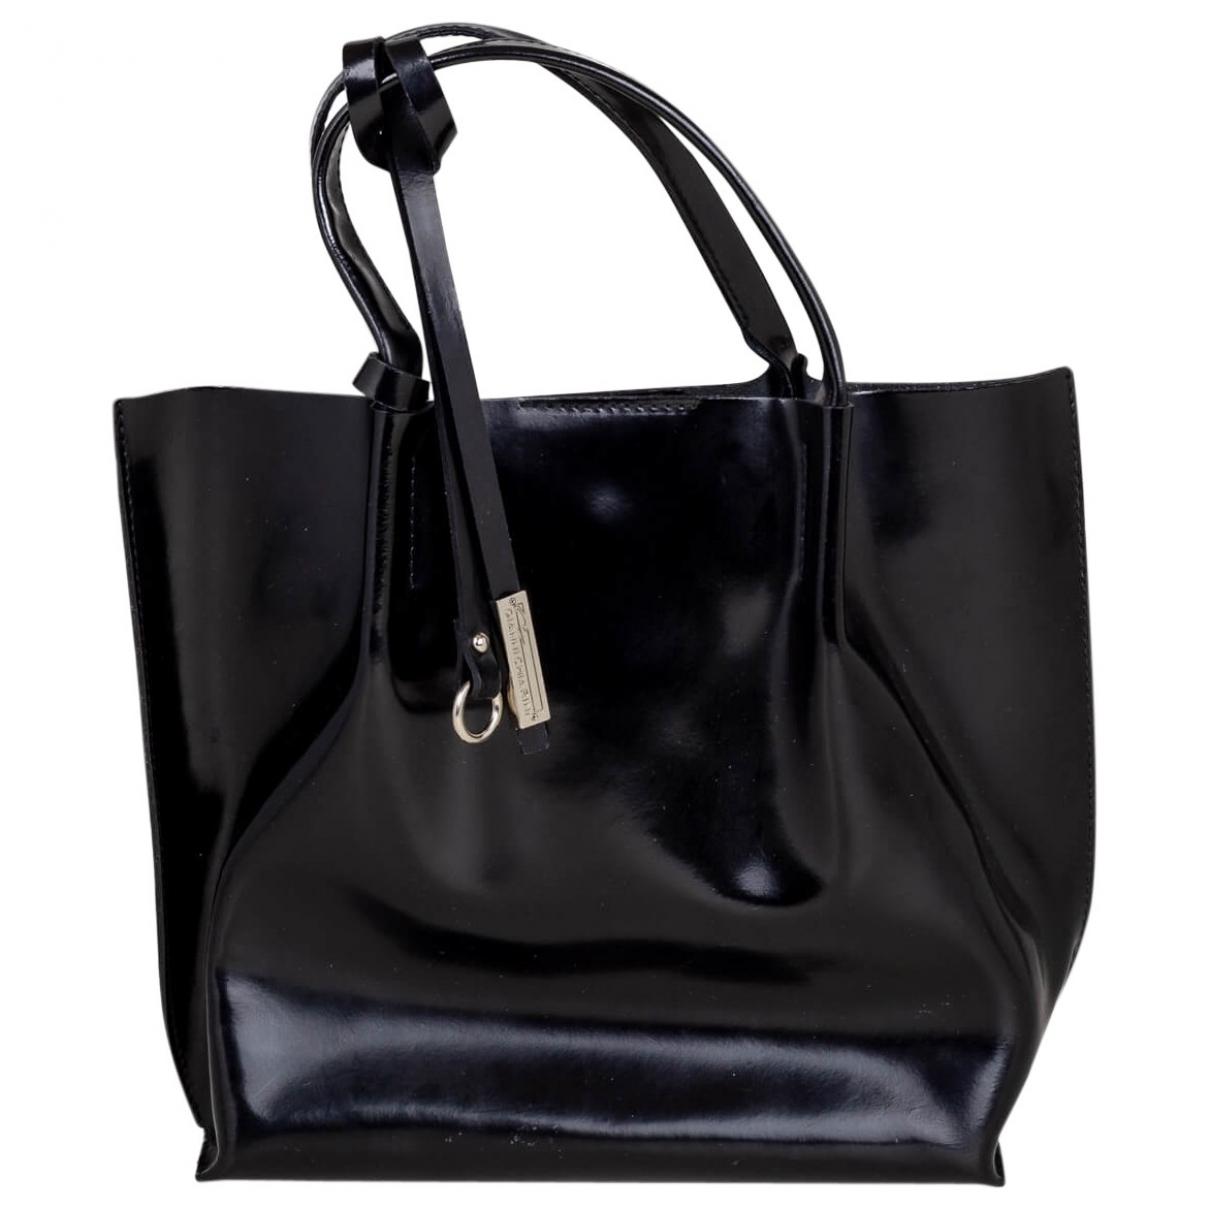 Gianni Chiarini \N Black Patent leather handbag for Women \N